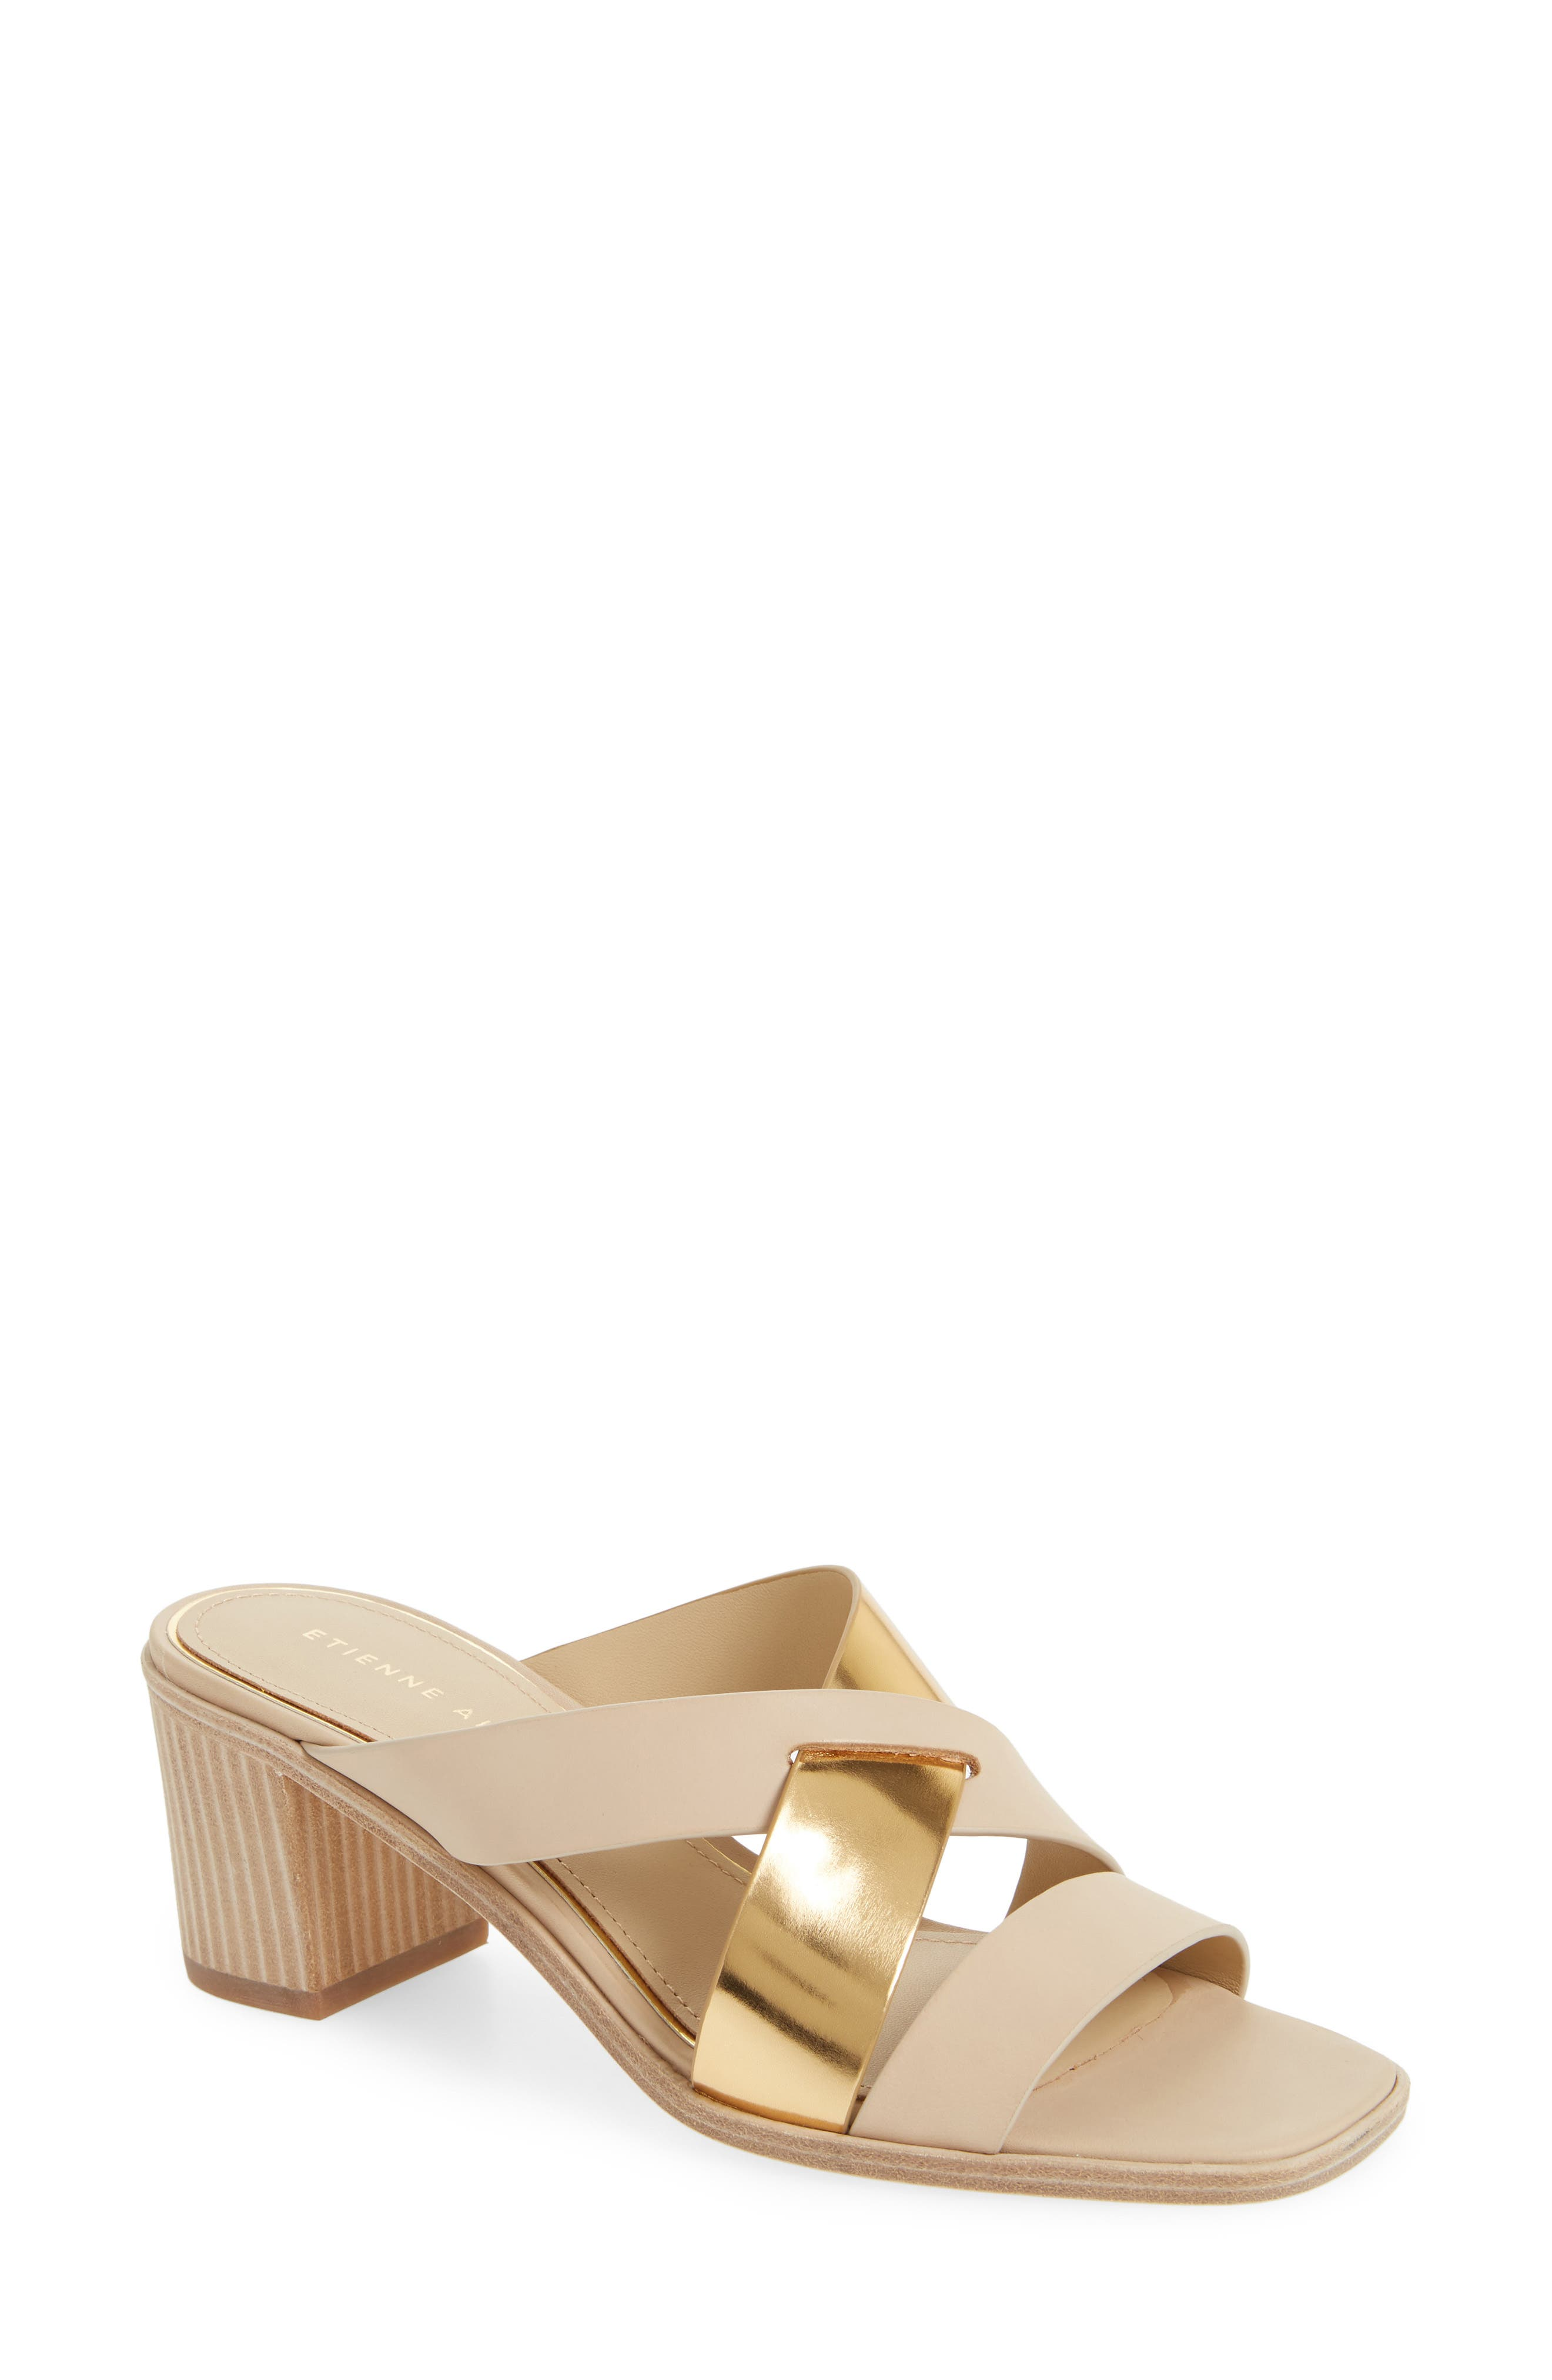 Negroni Cross Strap Mule Sandal,                             Main thumbnail 1, color,                             Natural/ Gold Leather